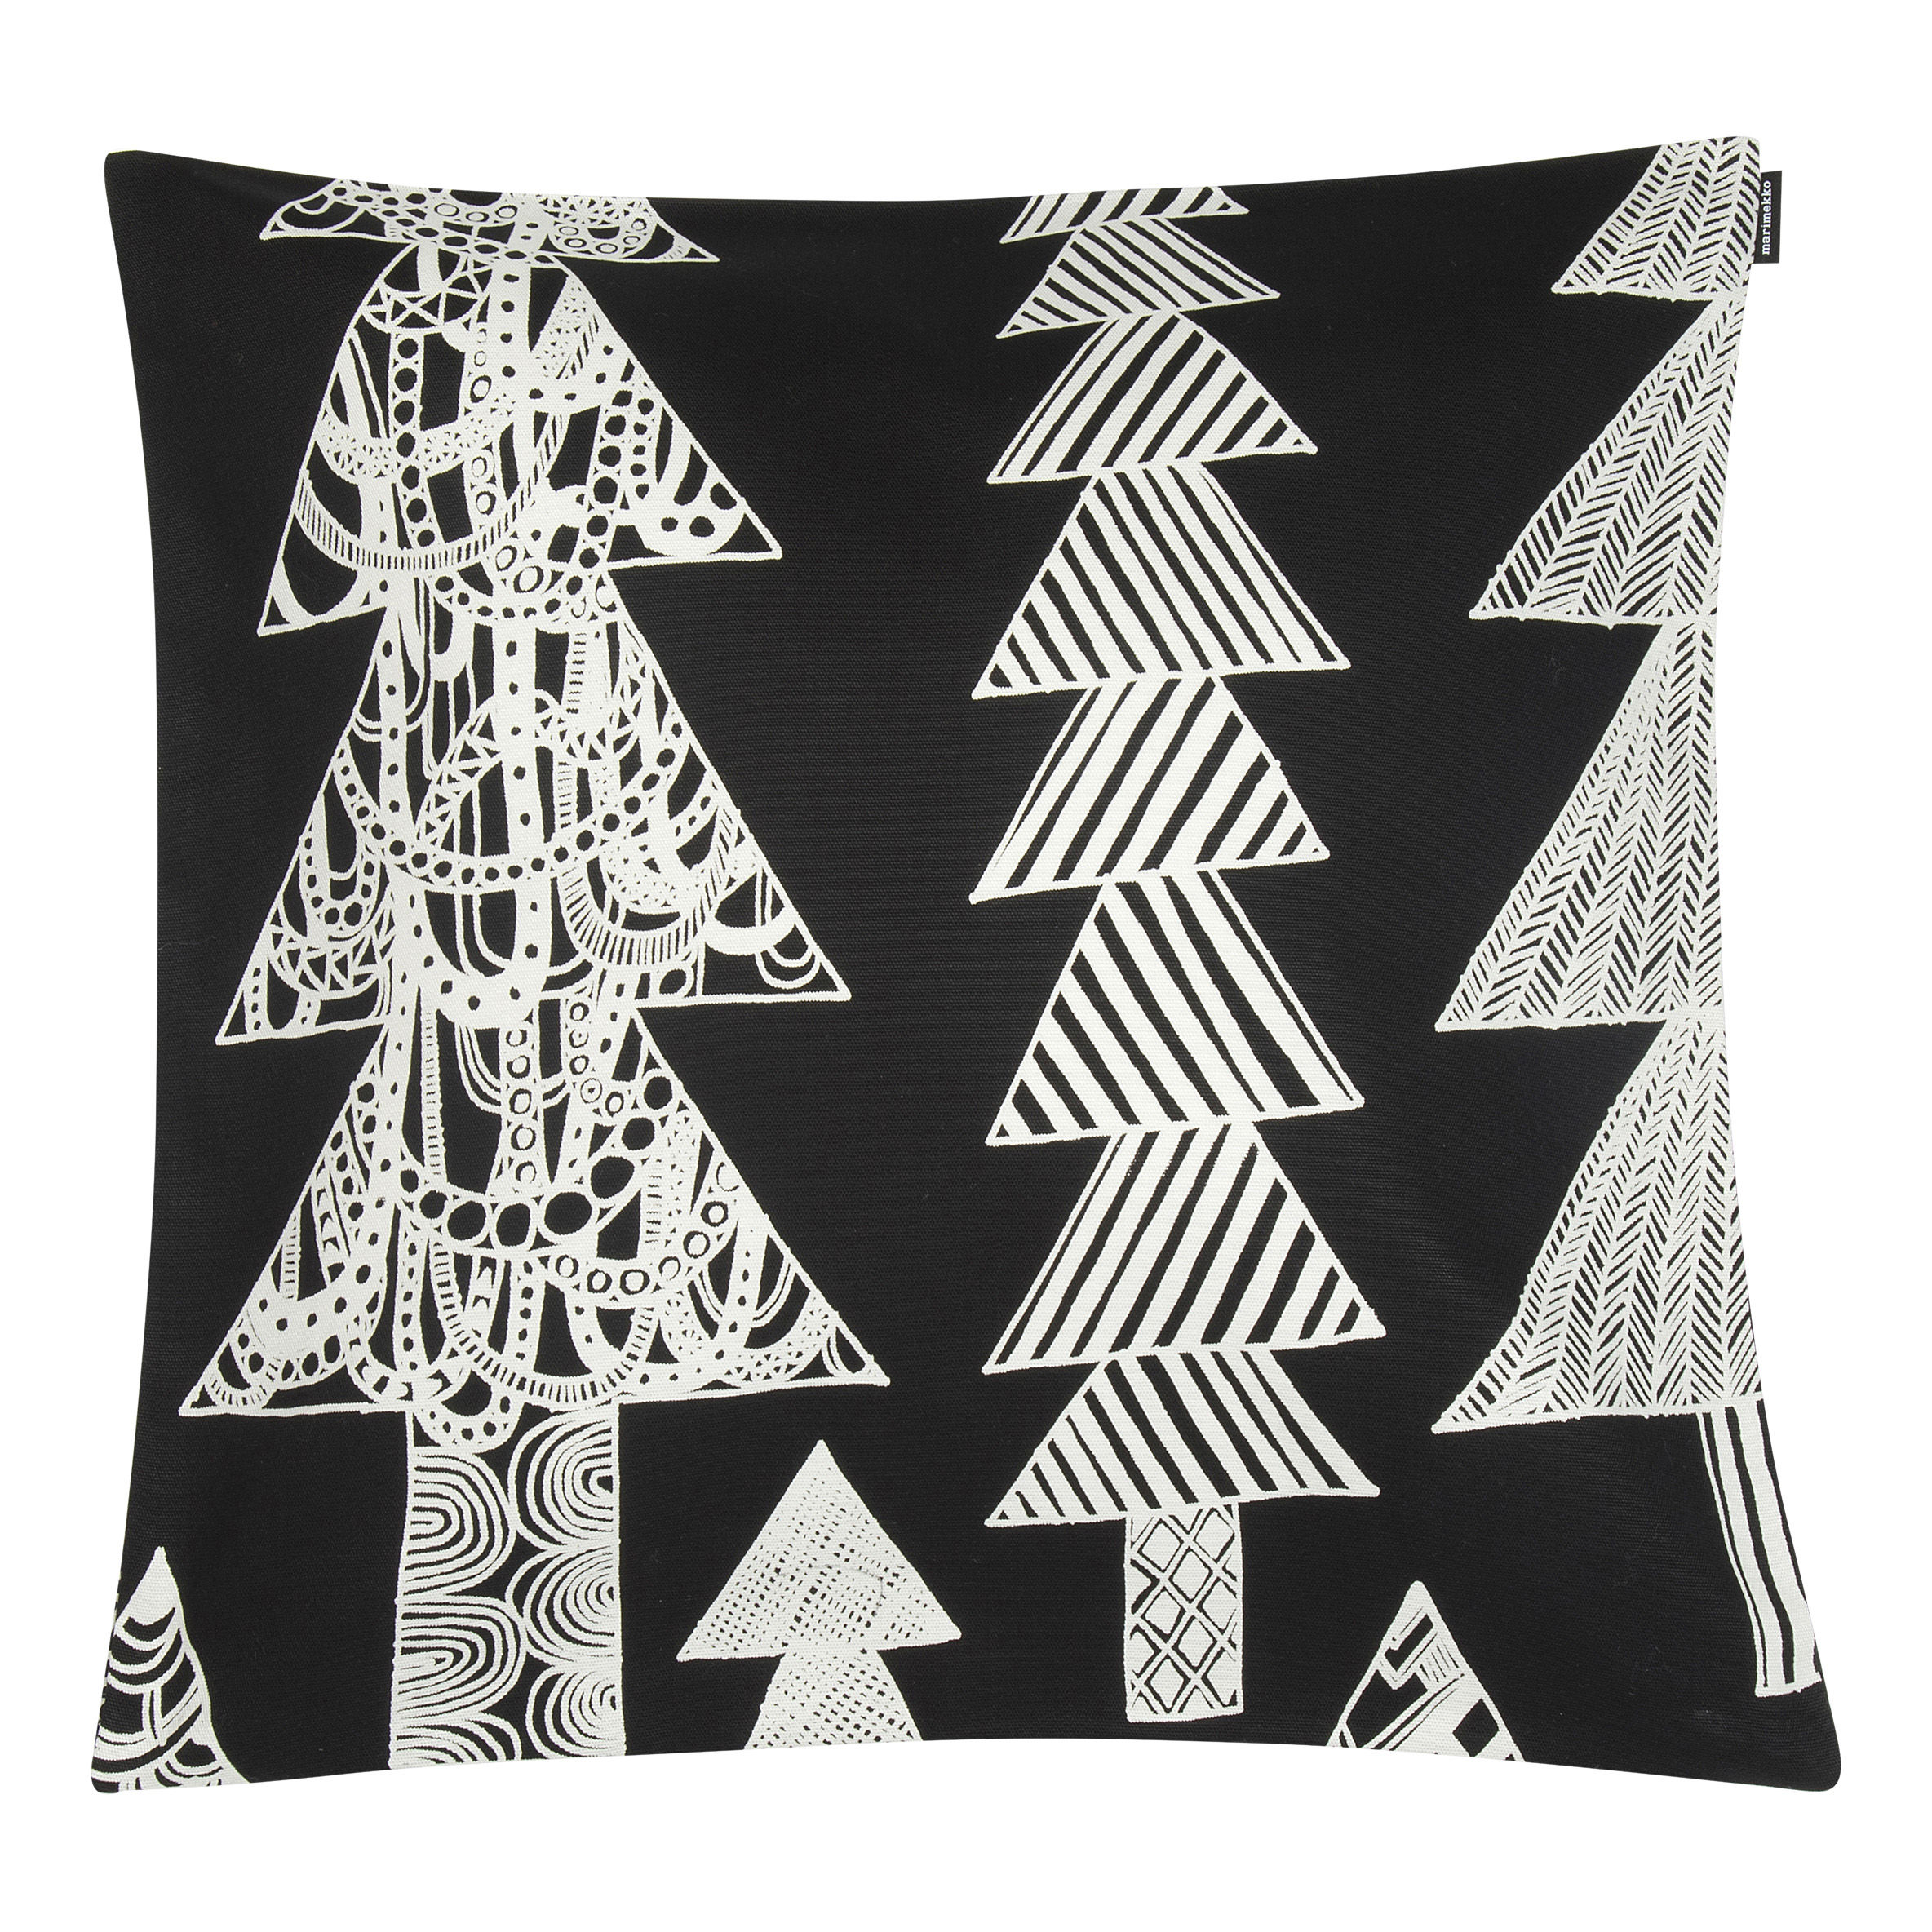 Decoration - Cushions & Poufs - Kuusikossa Cushion cover - / 45 x 45 cm by Marimekko - Kuusikossa / Black & white - Cotton